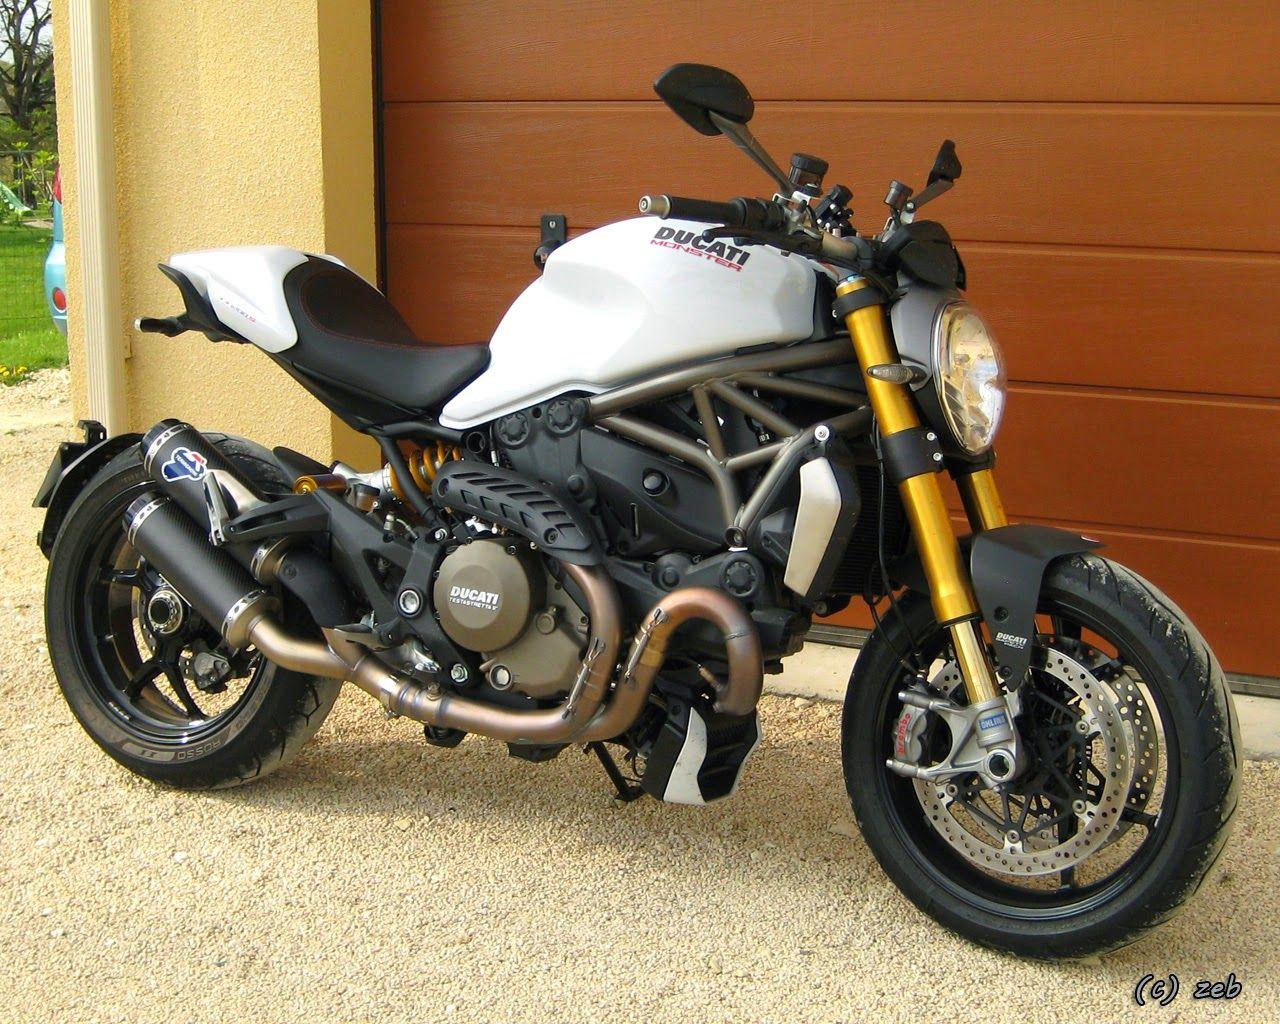 Ducati Monster 1200s With Termignoni Carbon Fiber Racing Silencer